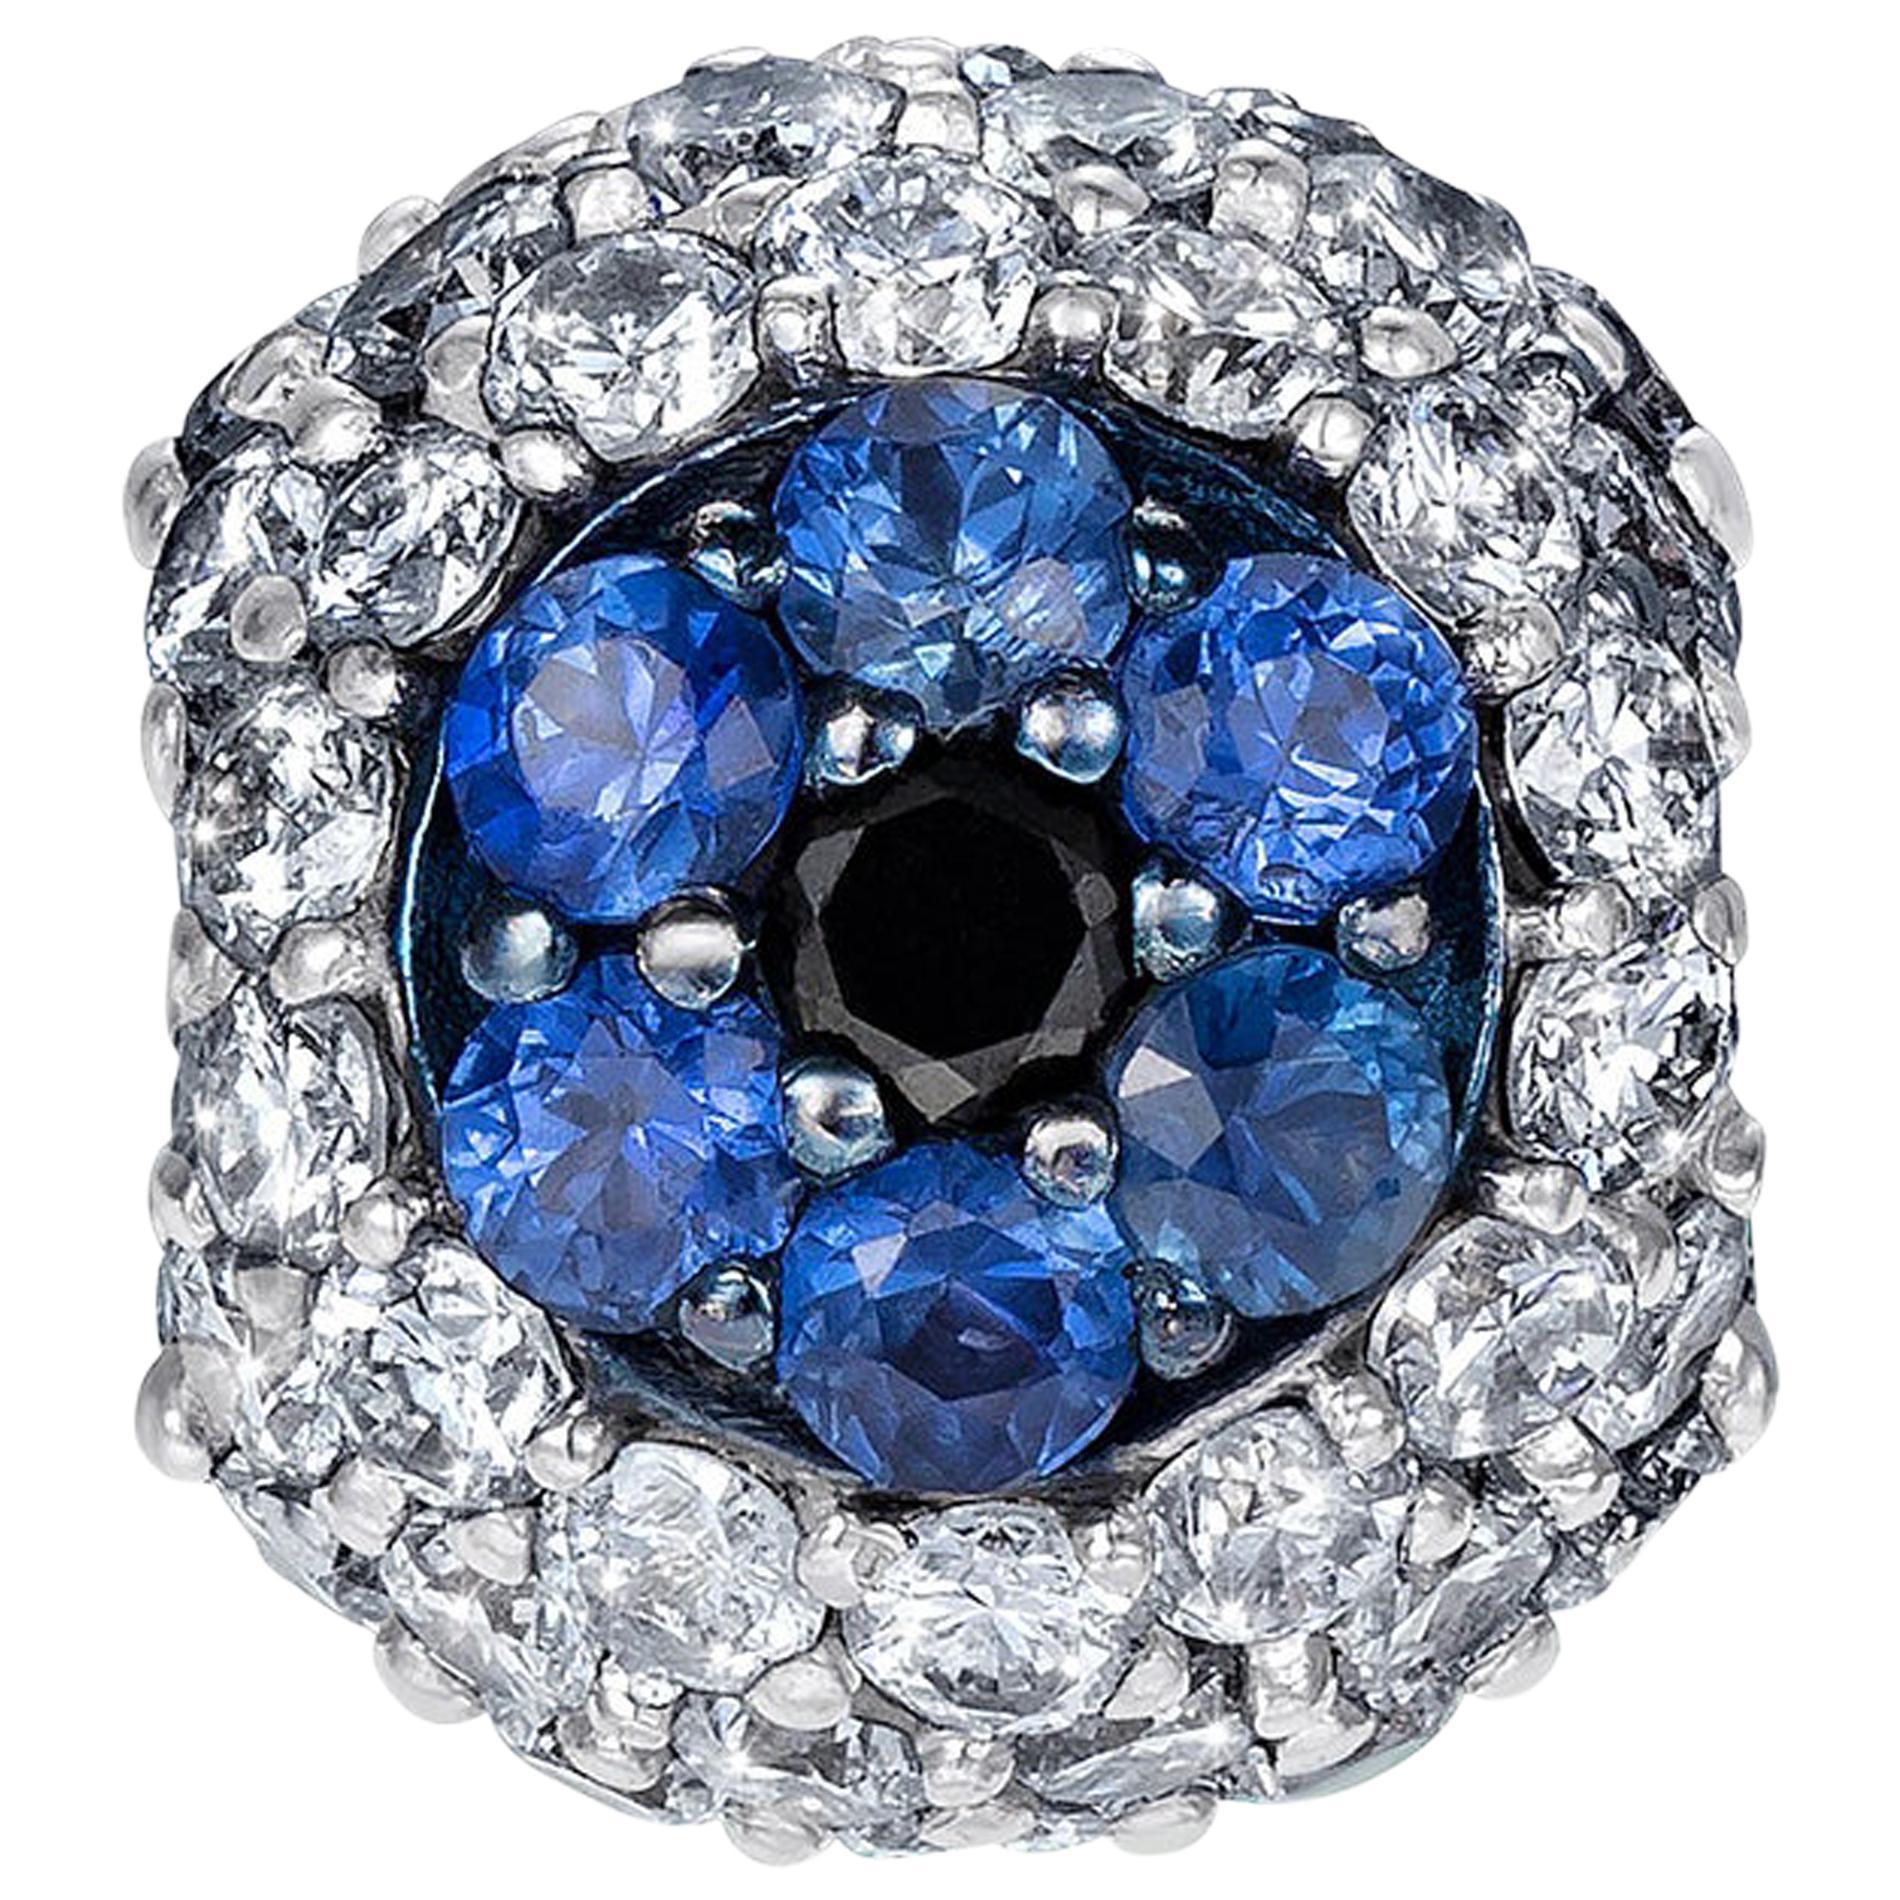 Sybarite Jewellery 0.78 Carats White Diamonds 18 Karat White Gold Charm